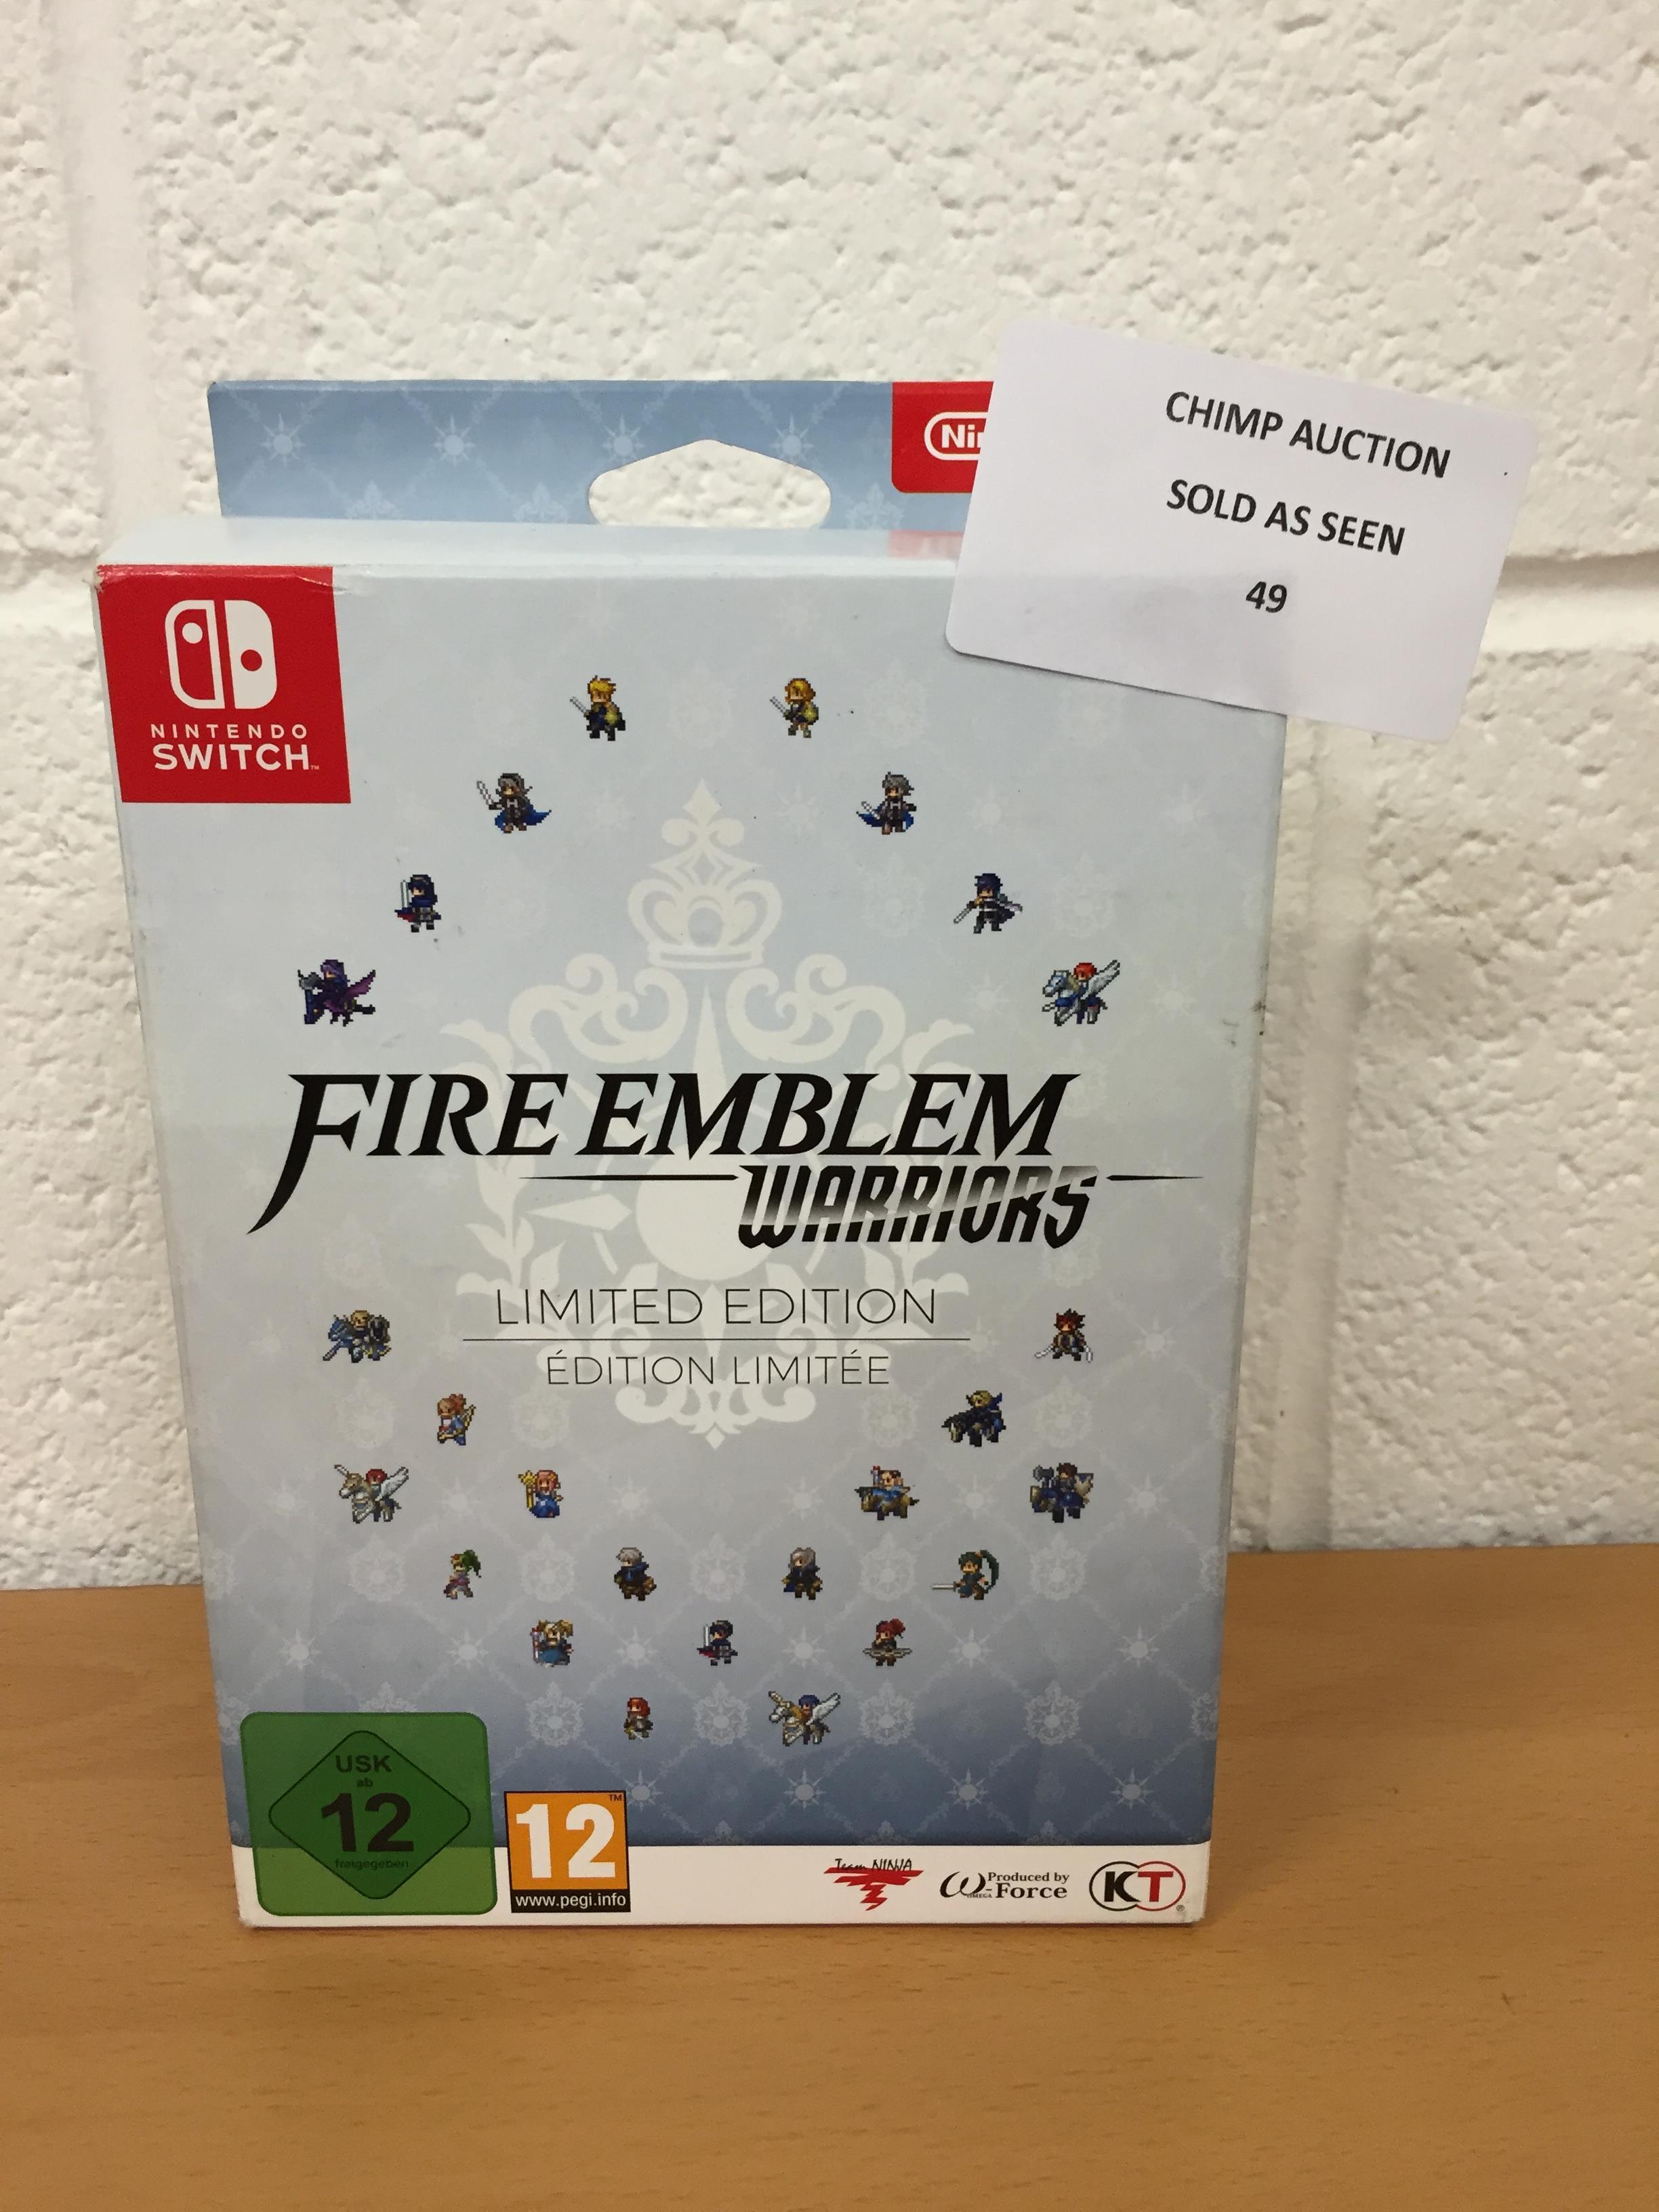 Lot 49 - Fire Emblem Warriors Limited Edition (Nintendo Switch) RRP £79.99